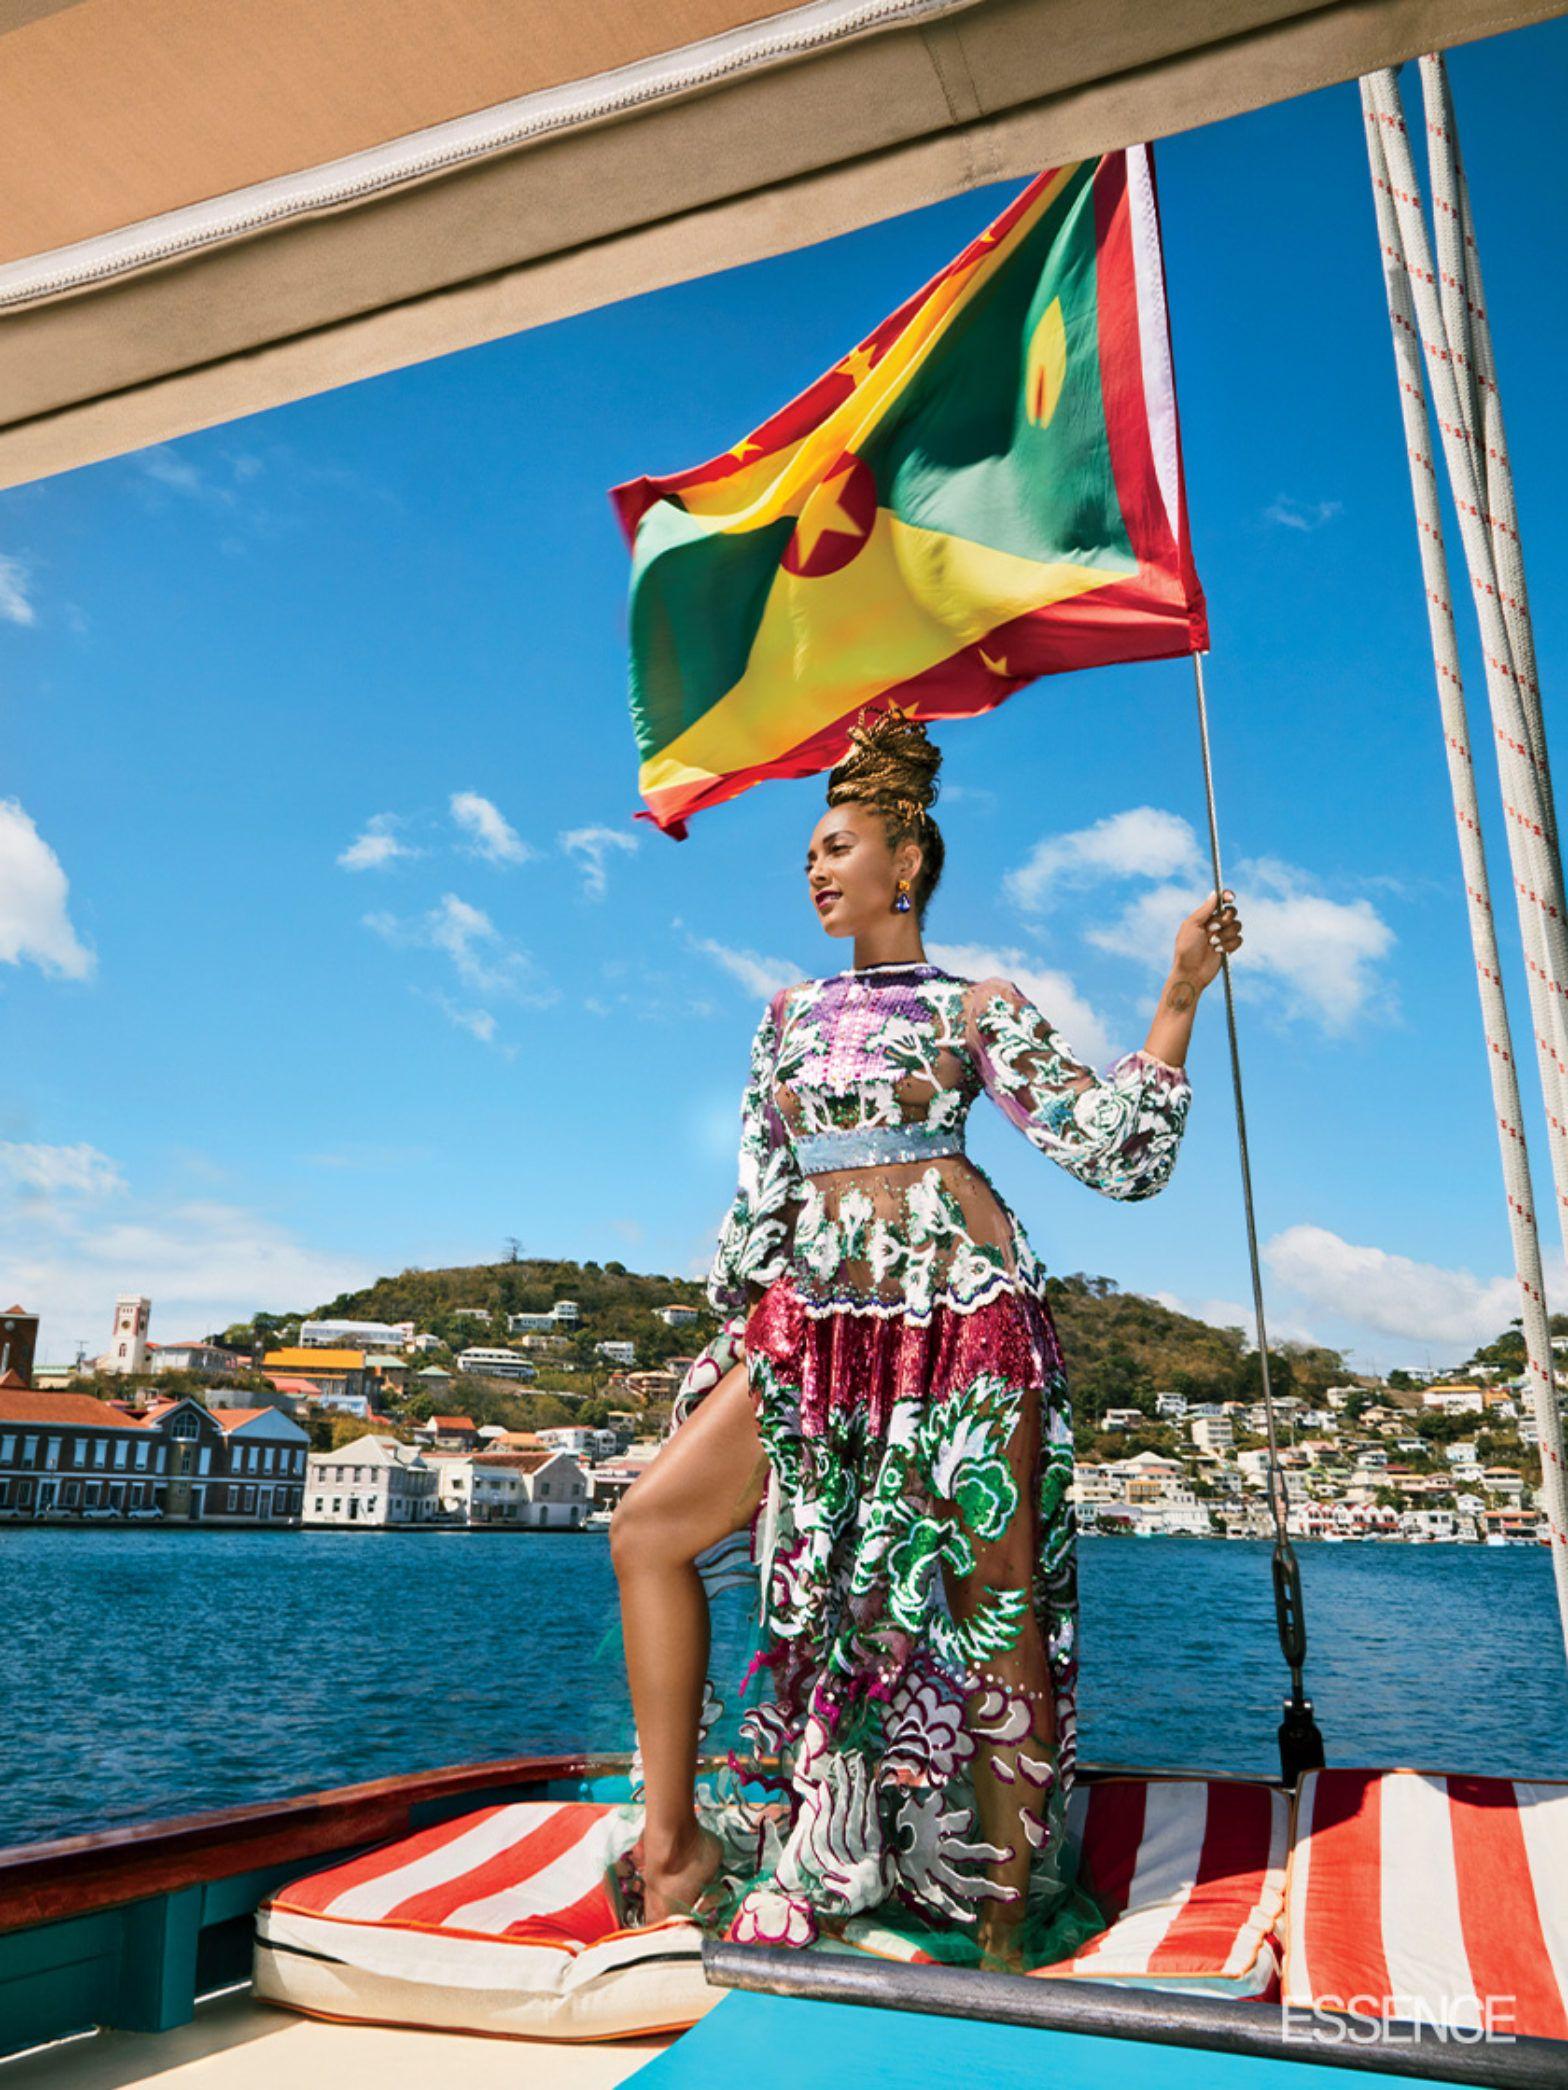 Essence Magazine Grenada Getaway